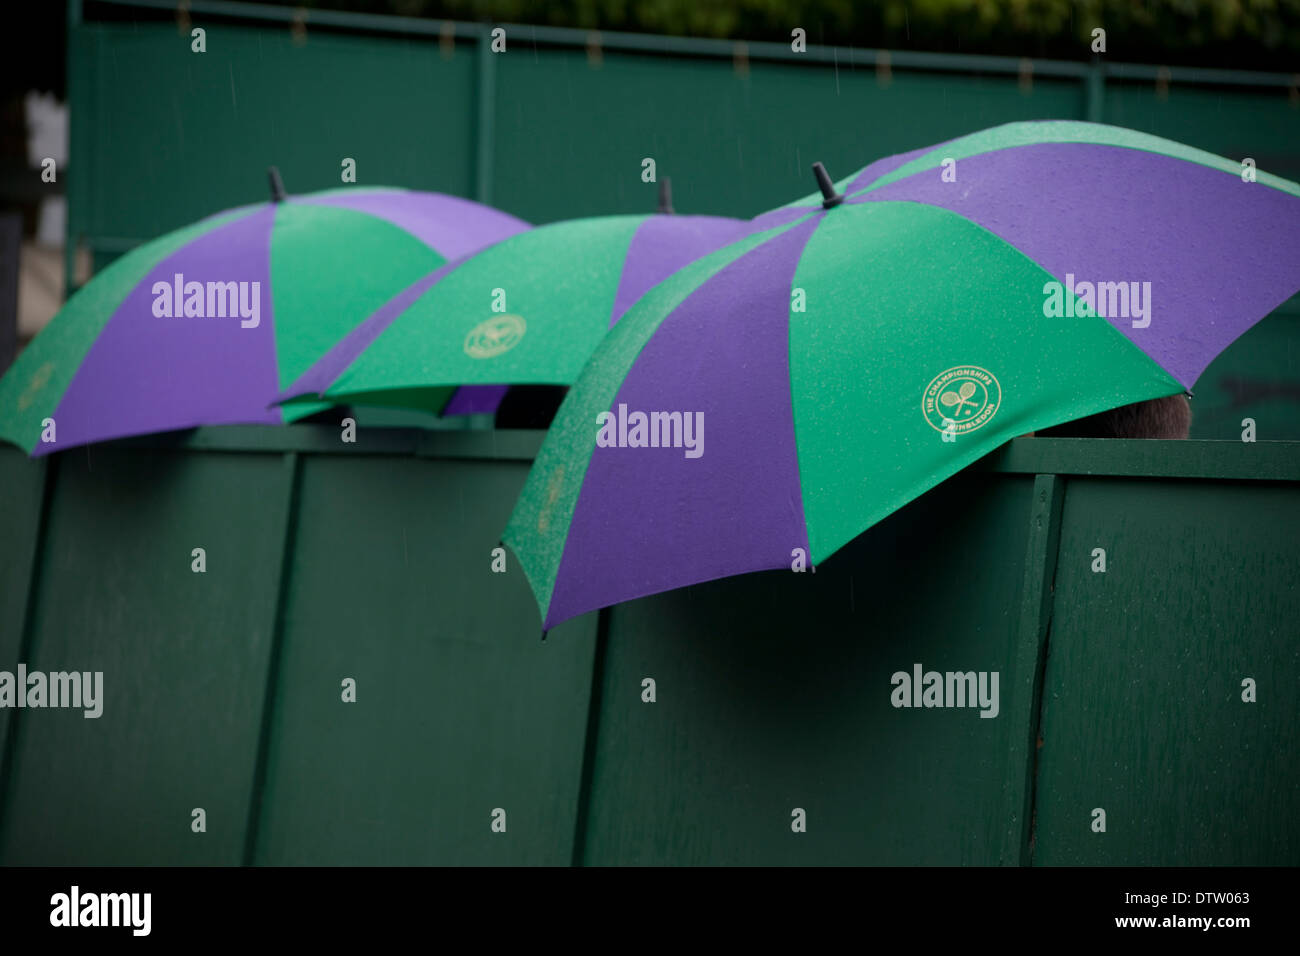 Thee Wimbledon umbrellas open in rain - Stock Image